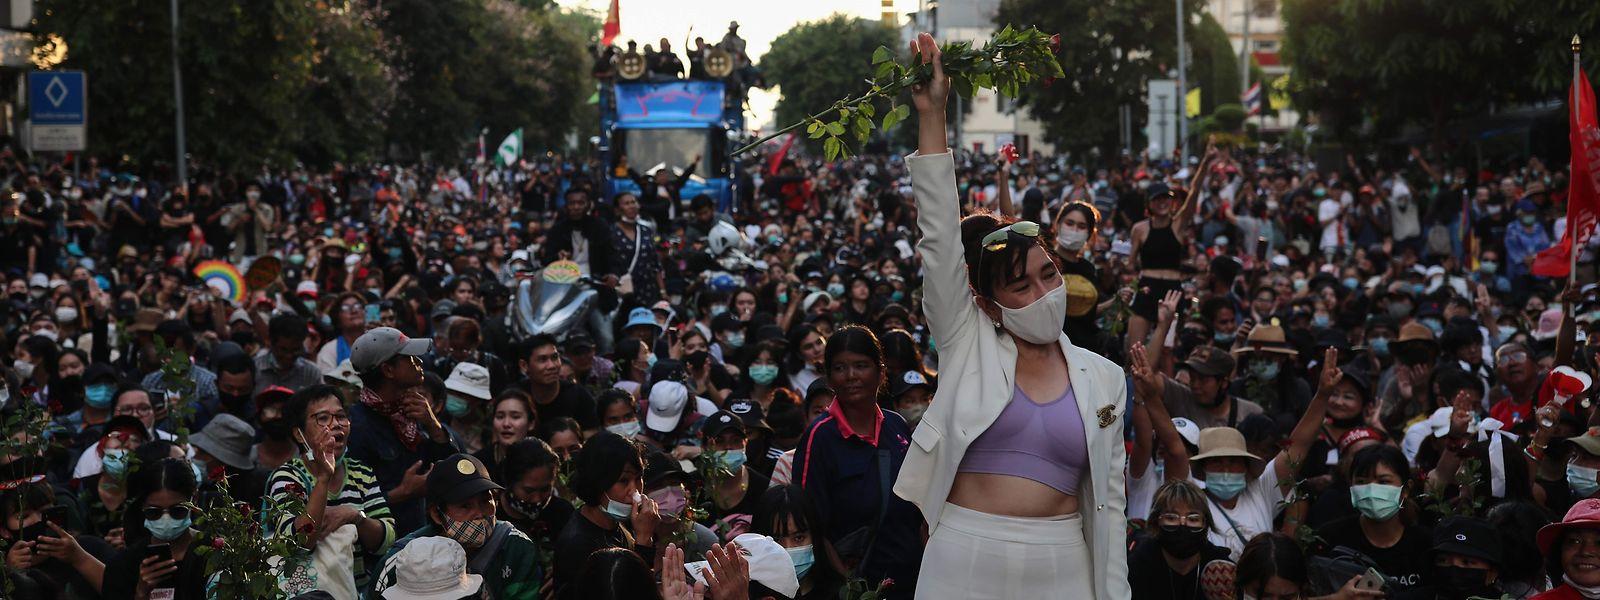 """Nieder mit der Diktatur, lang lebe Demokratie!"", skandieren die Demonstranten in Bangkok."